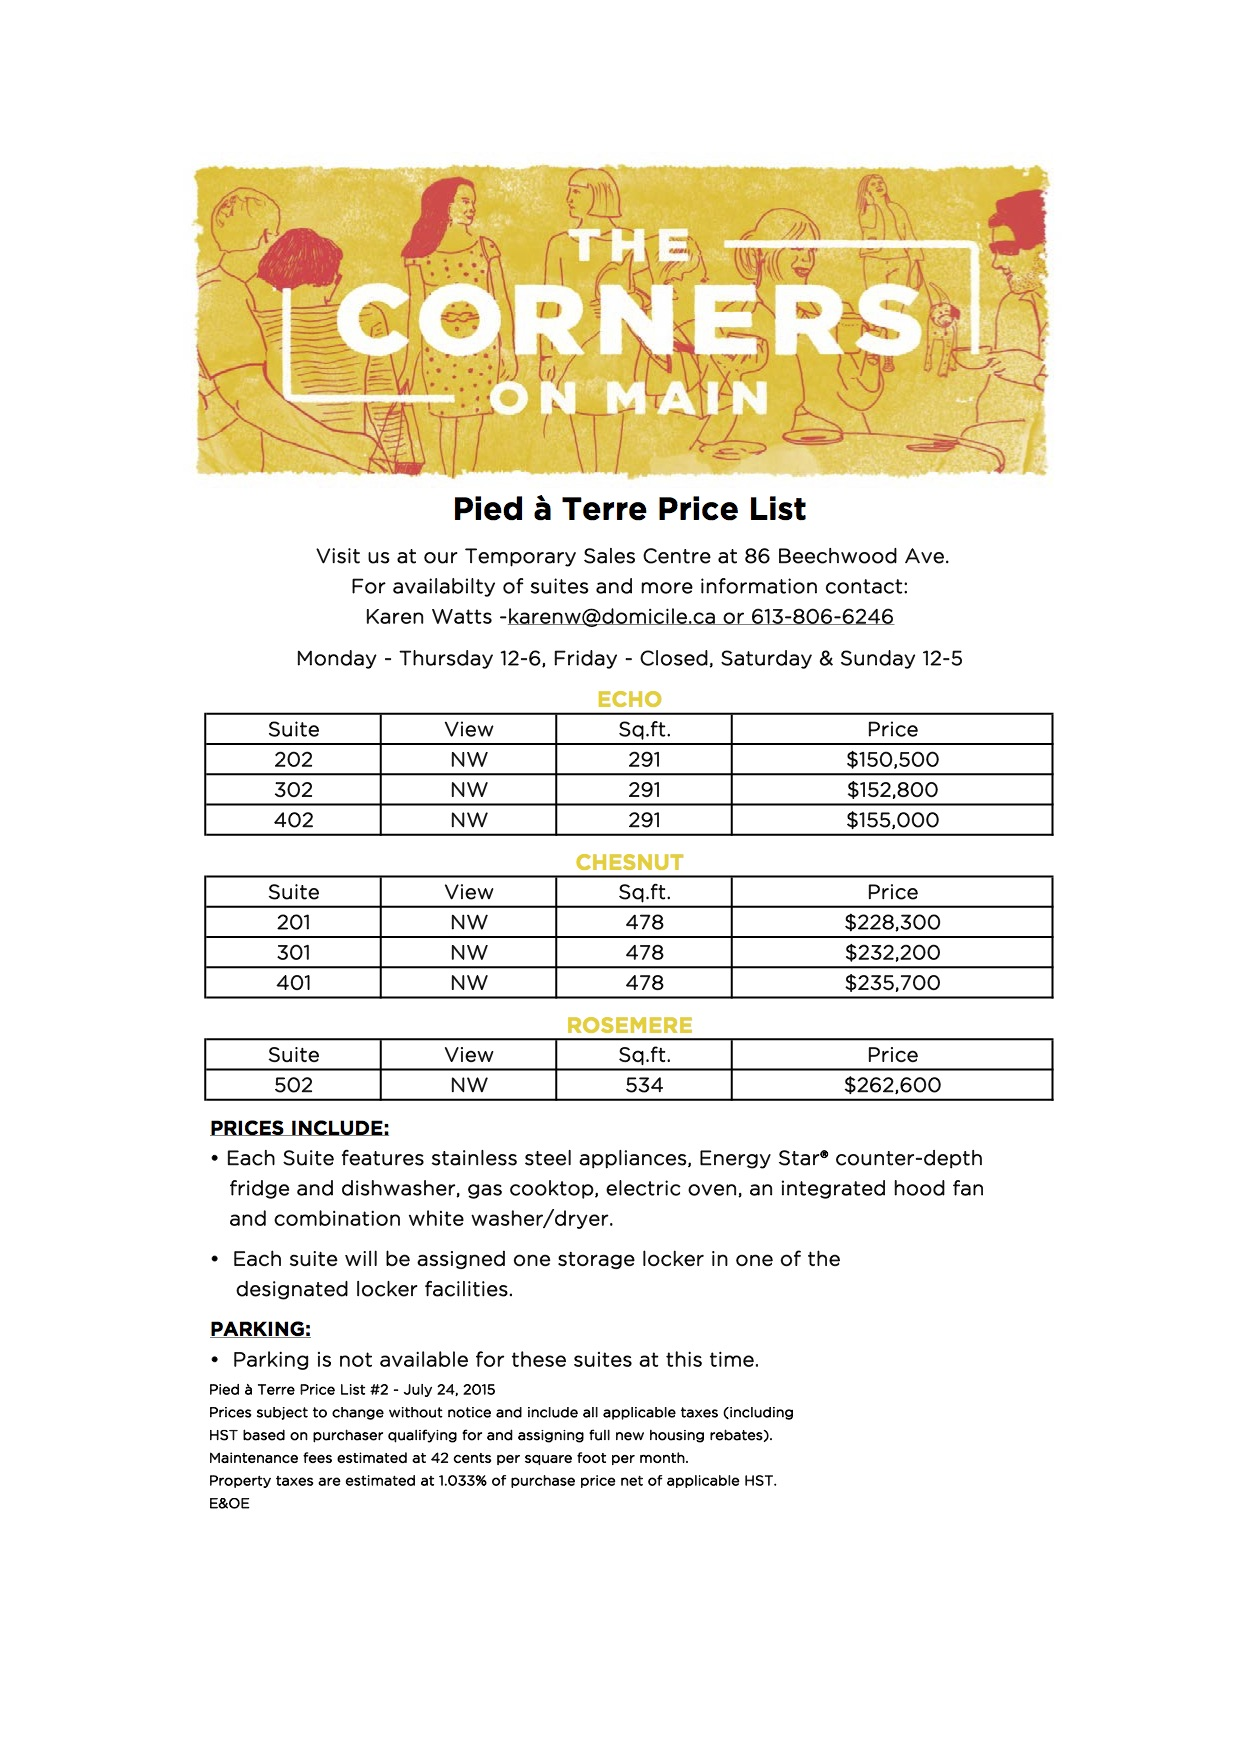 Corners On Main Pricelist_July_24_2015.jpg